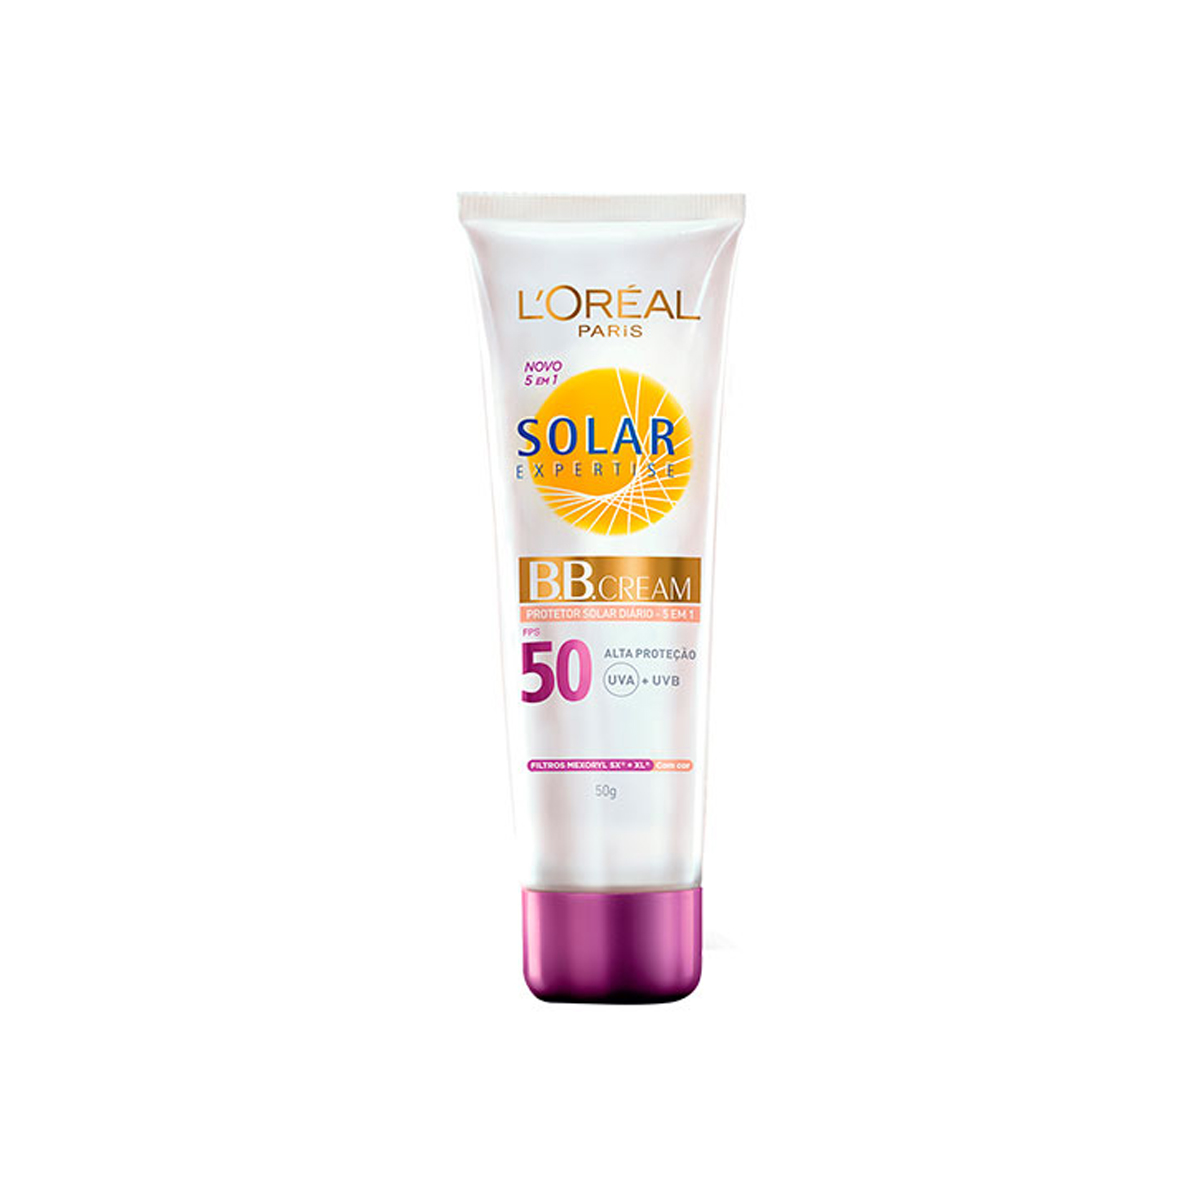 B.B Cream com Protetor Solar L'oreal Expertise FPS50 L'Oréal 50ml